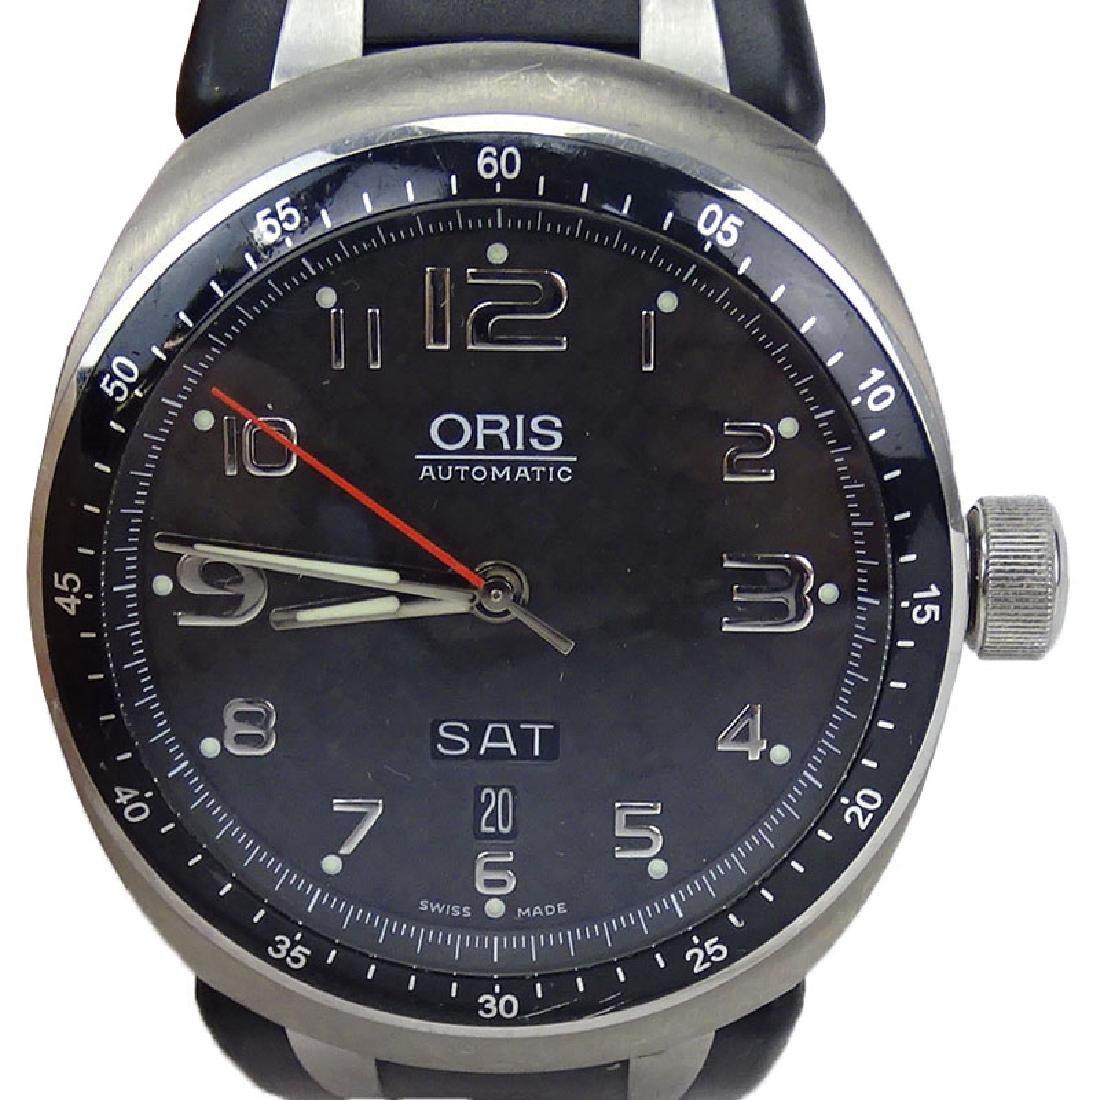 Men's Oris Automatic Watch, Titanium Case with Skeleton